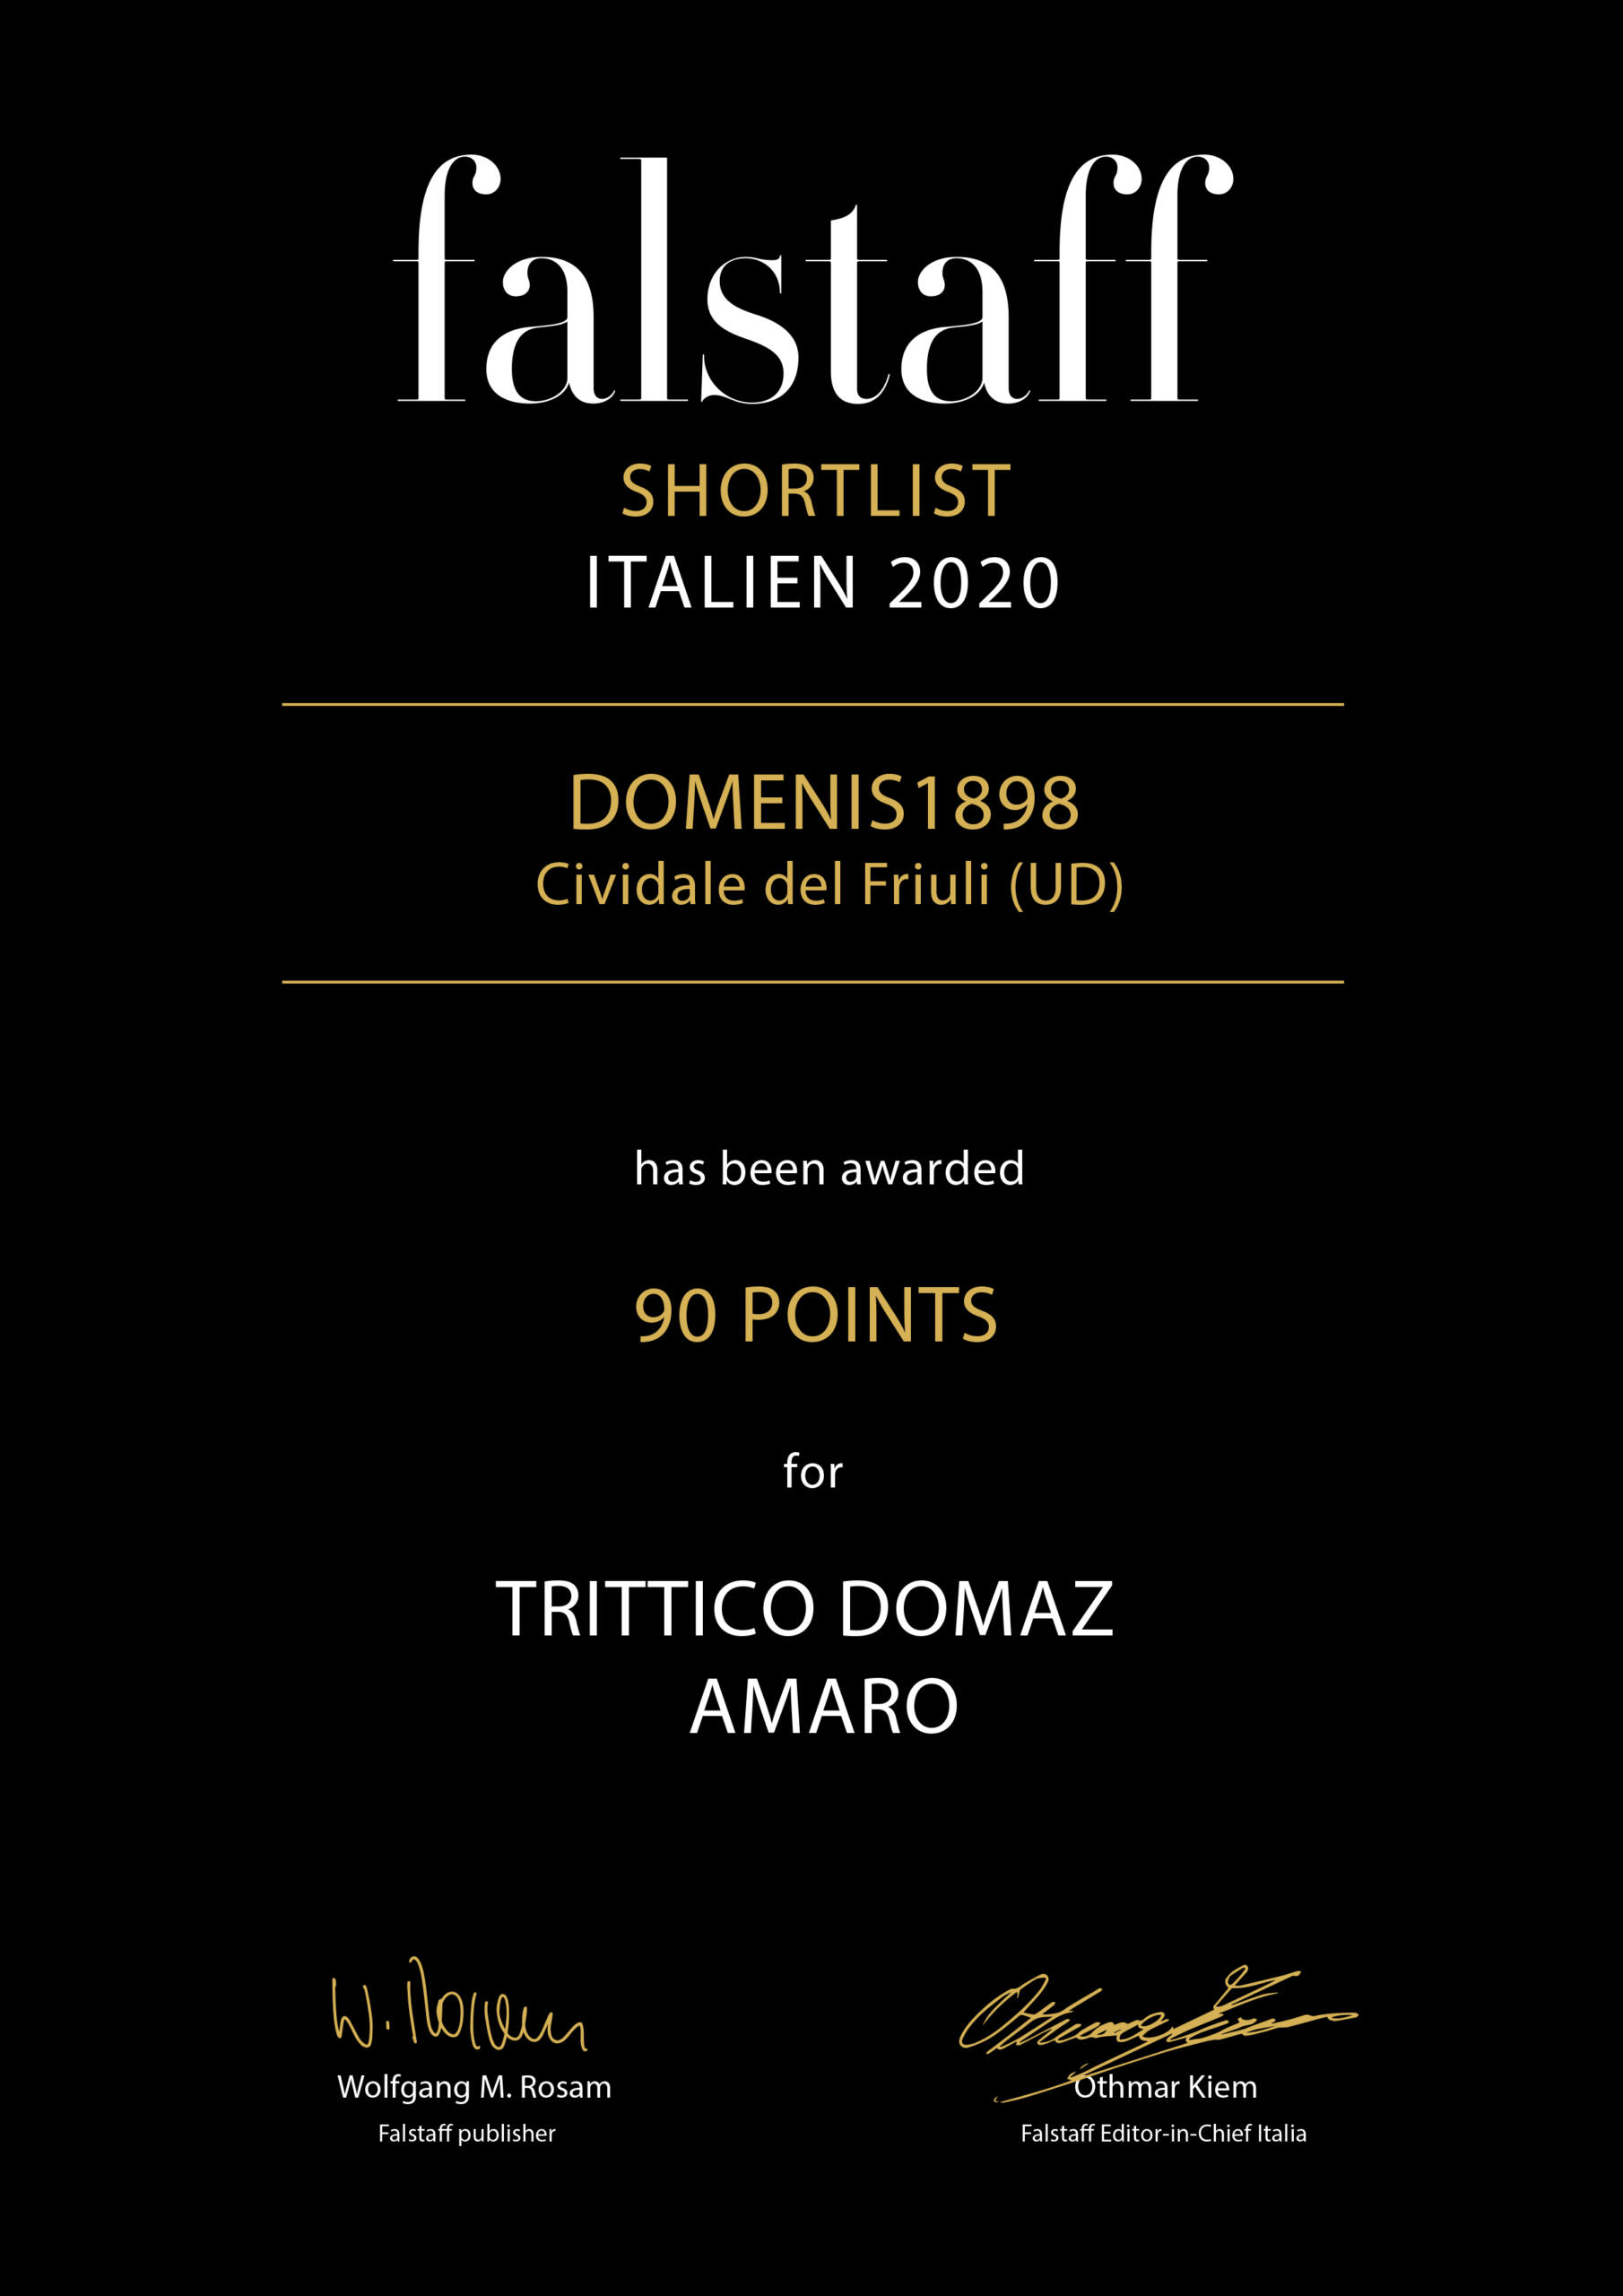 Falstaff Shortlist Italien 2020 – Trittico DOMAZ